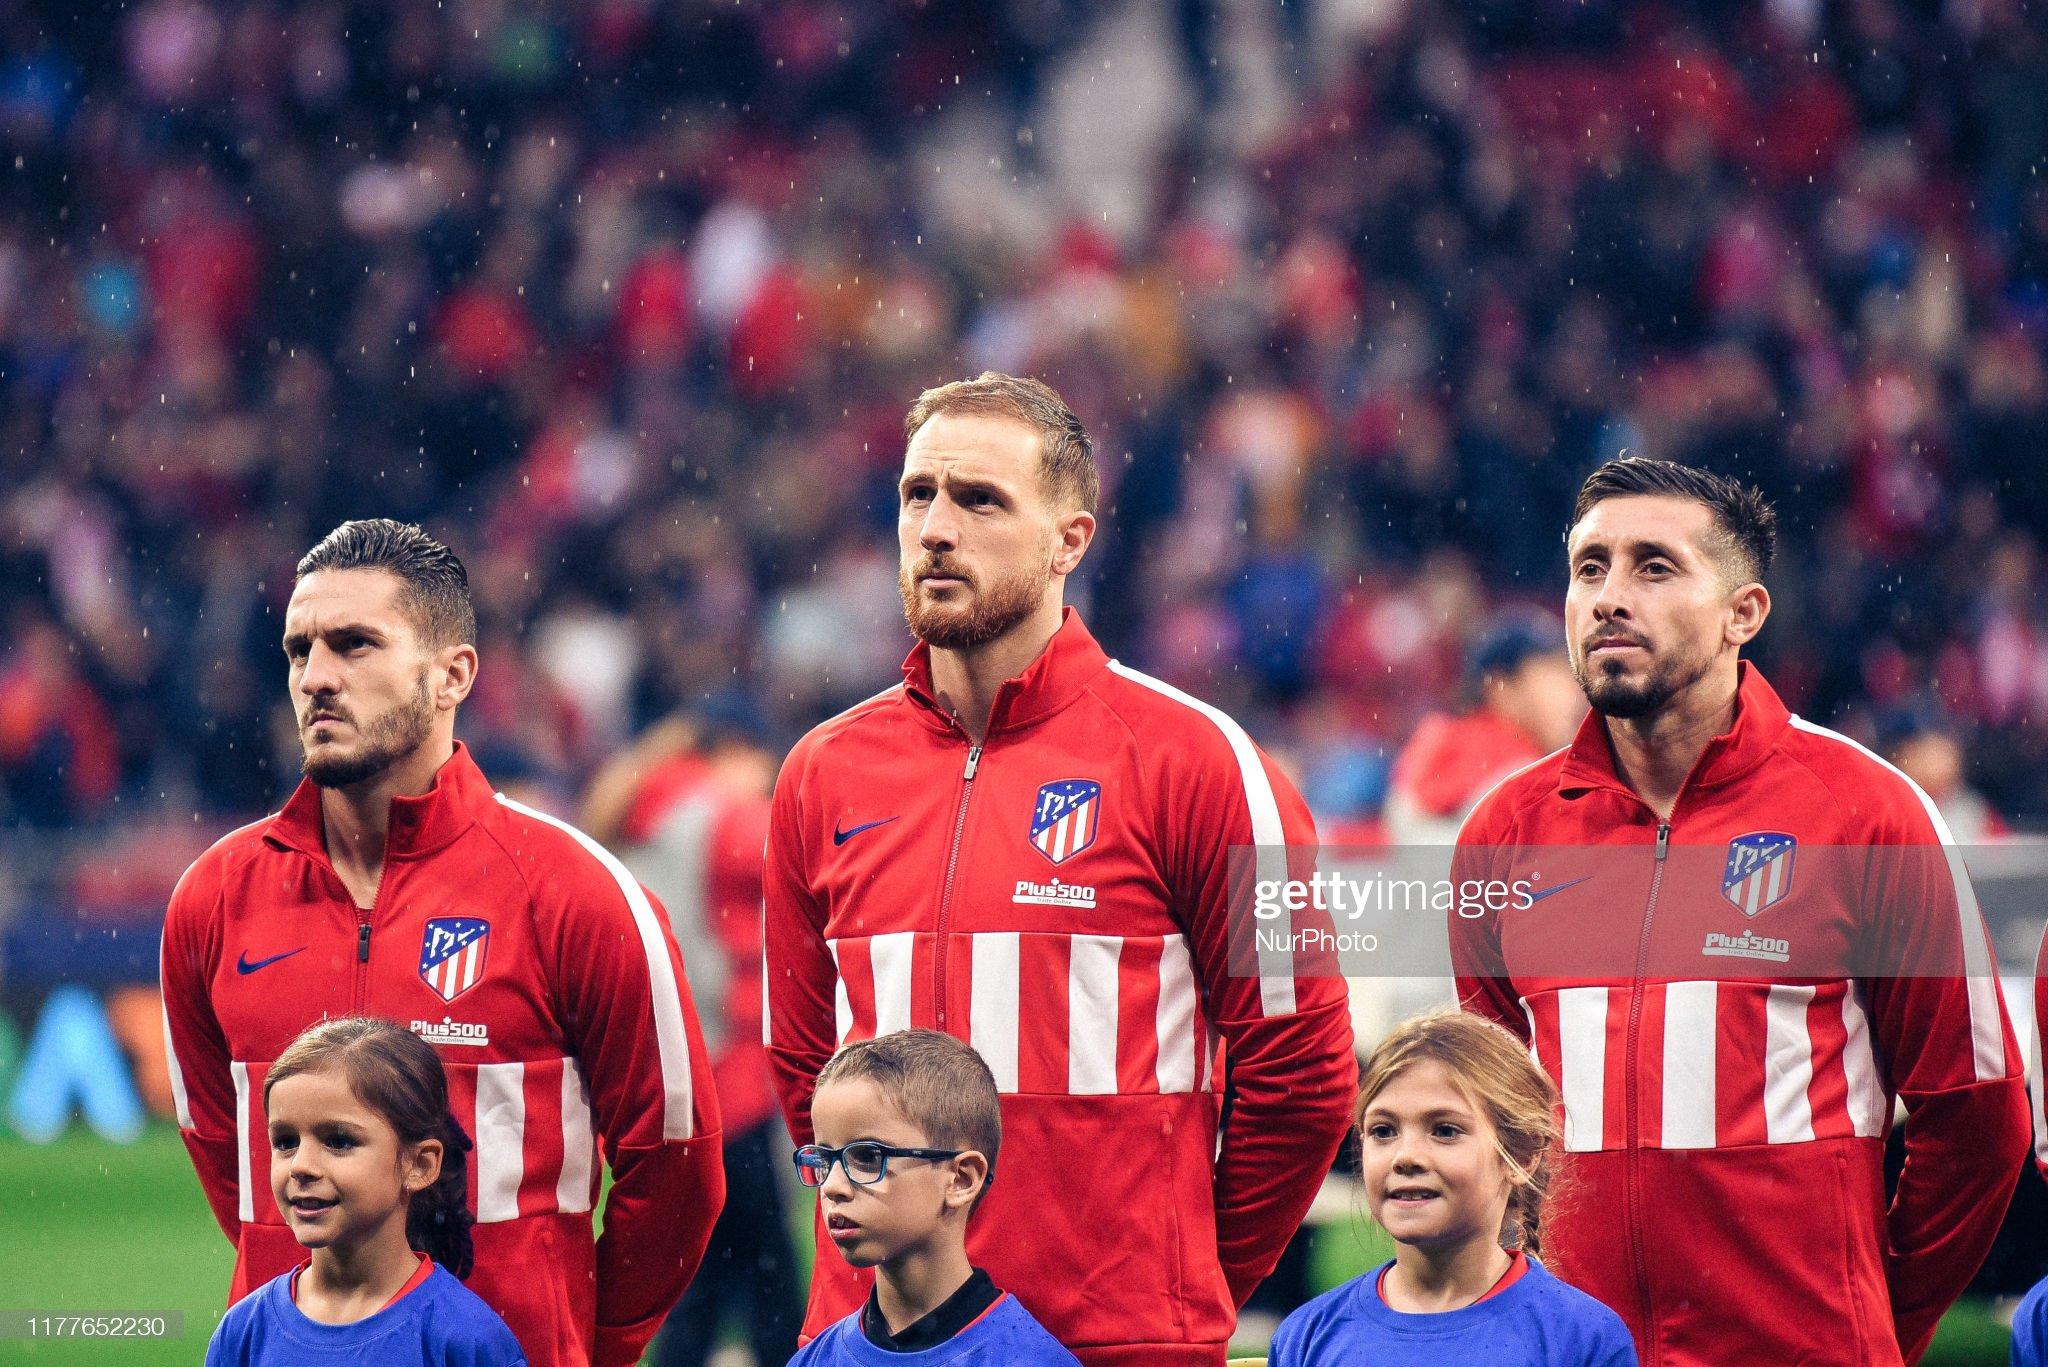 ¿Cuánto mide Héctor Herrera? - Altura - Página 2 Koke-jan-oblak-and-hector-herrera-during-uefa-champions-league-match-picture-id1177652230?s=2048x2048